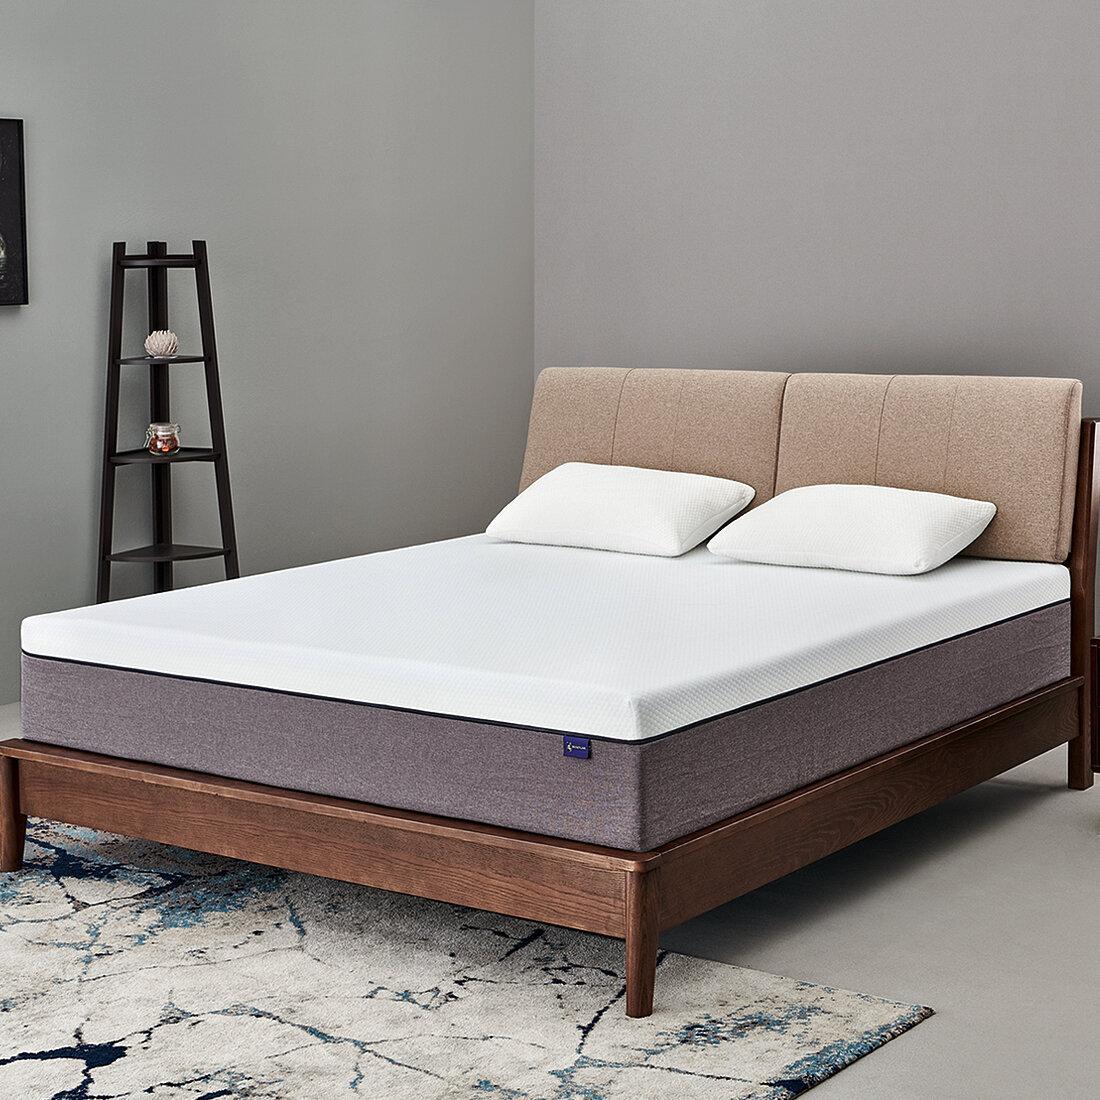 "Ssecretland 10"" Medium Gel Memory Foam Sofa Bed Mattress & Reviews"